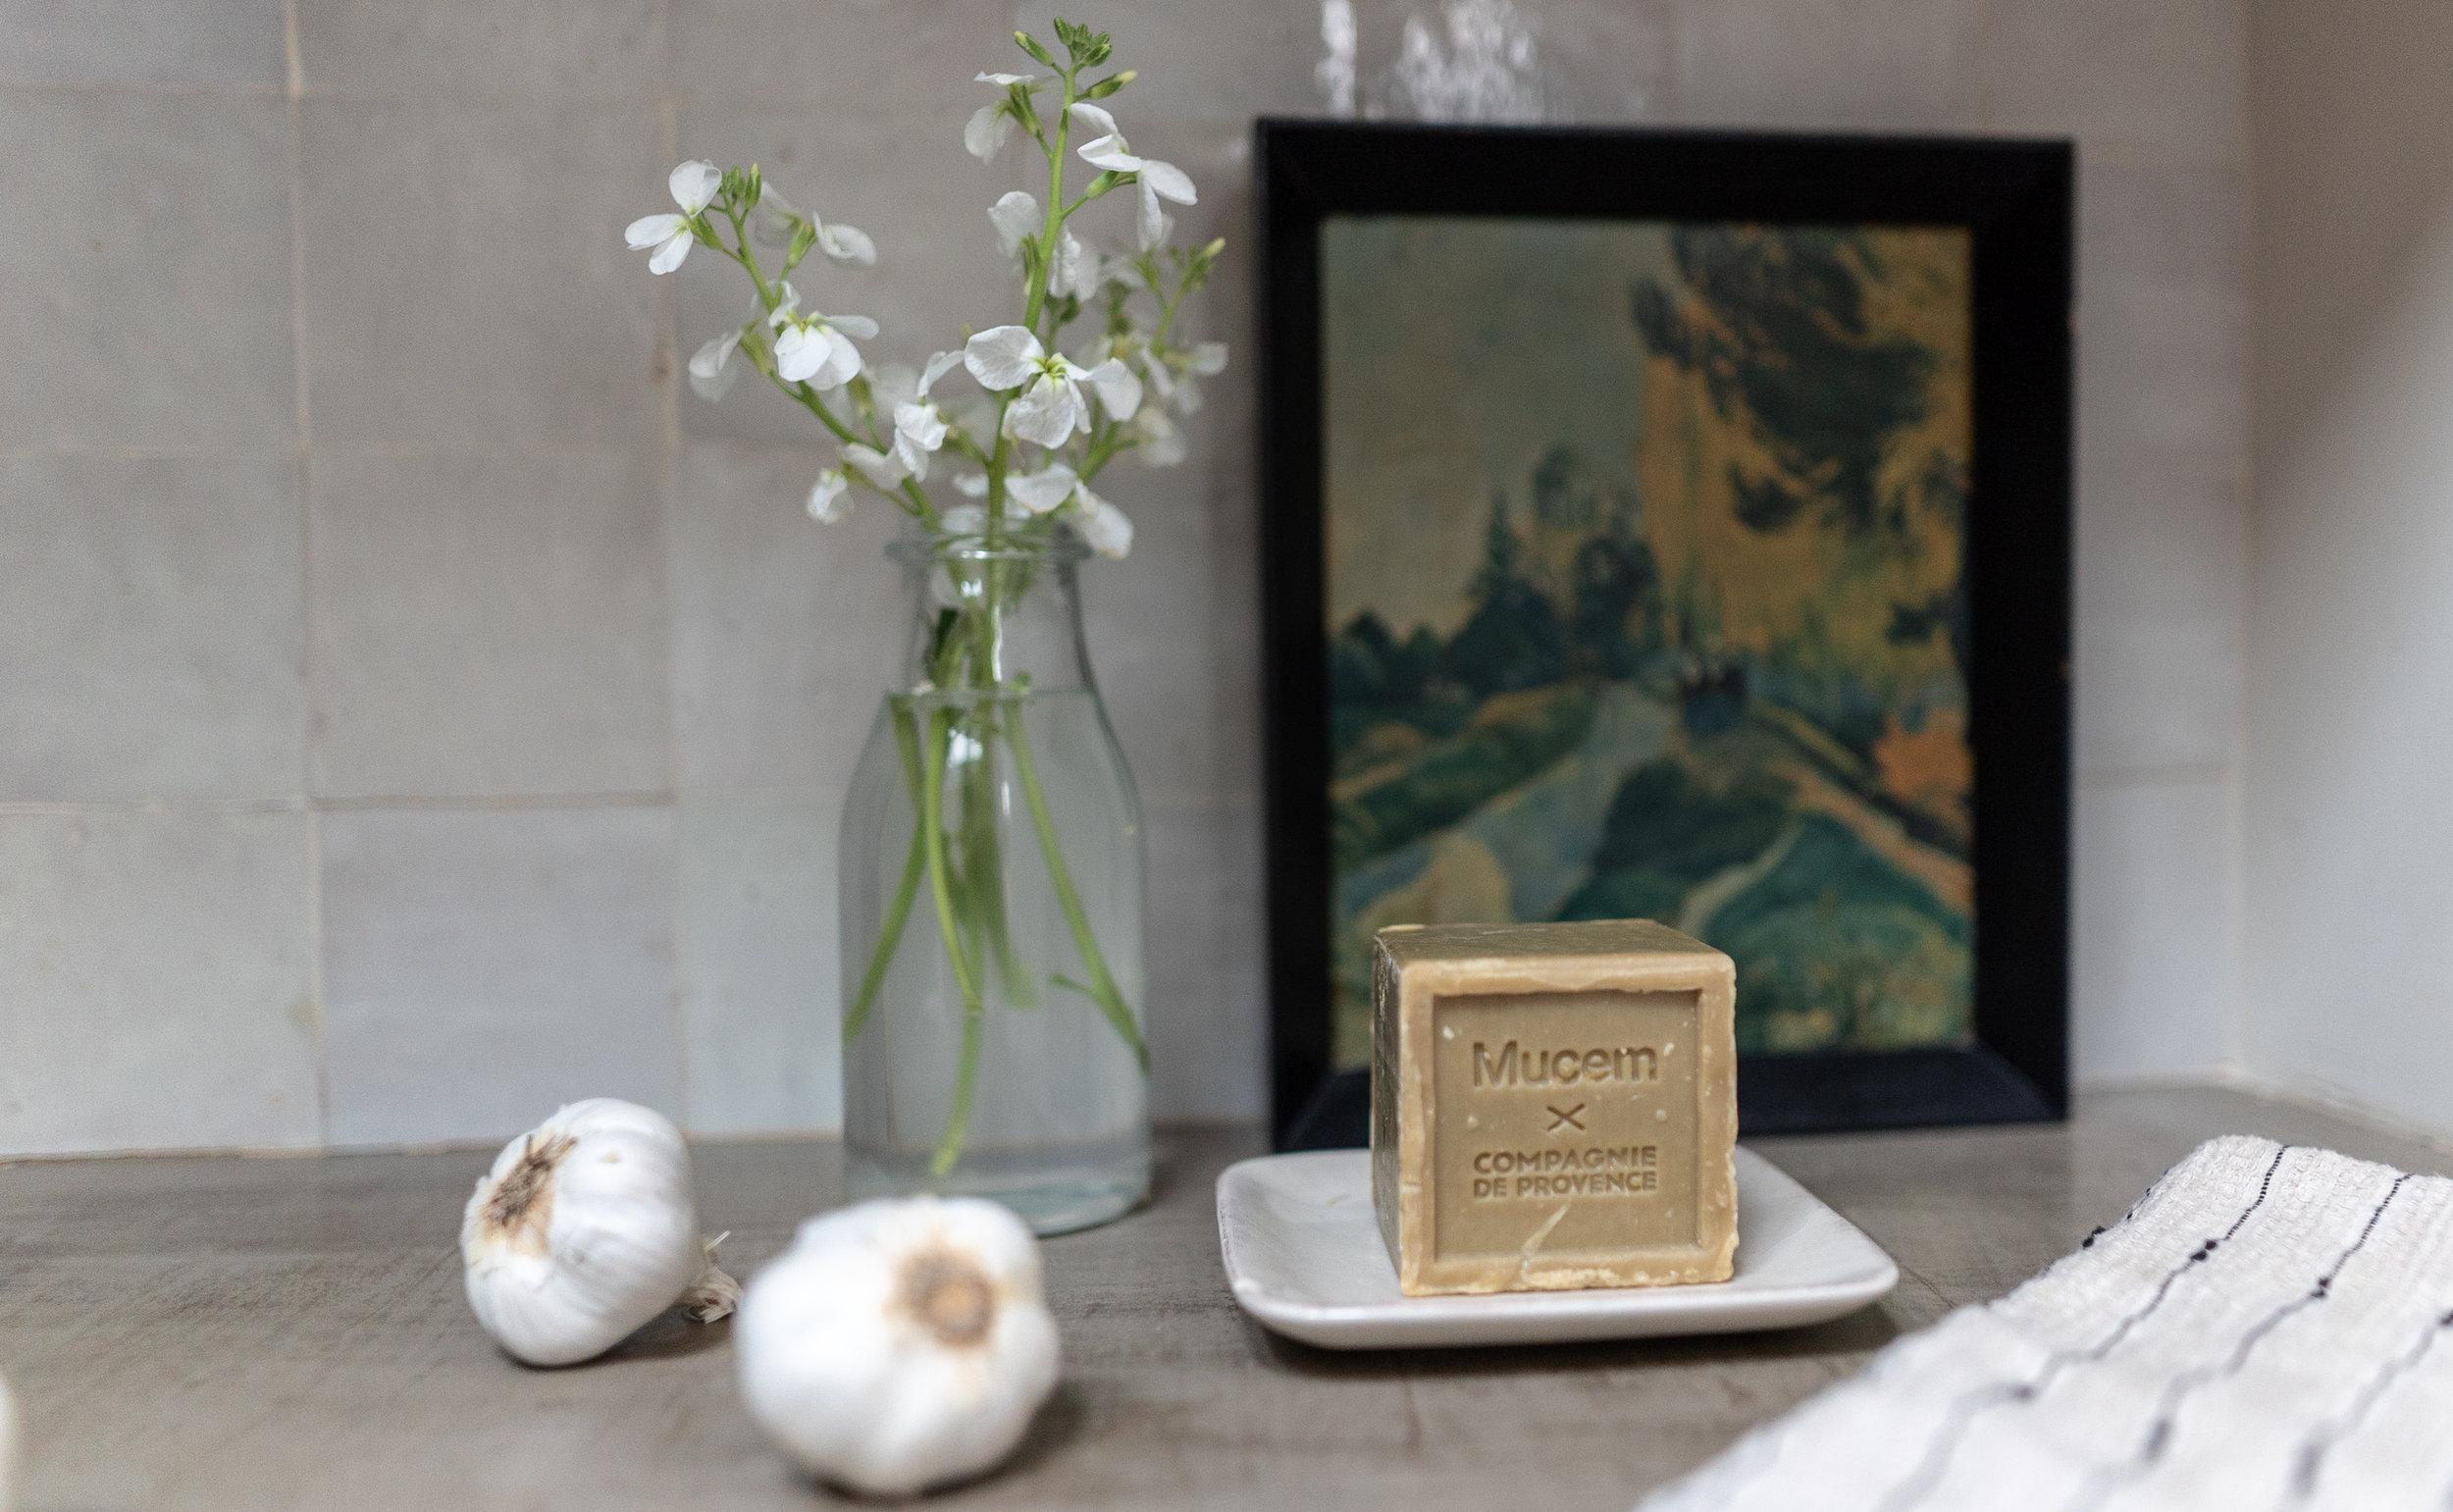 countertop close up of soap-00124.jpg